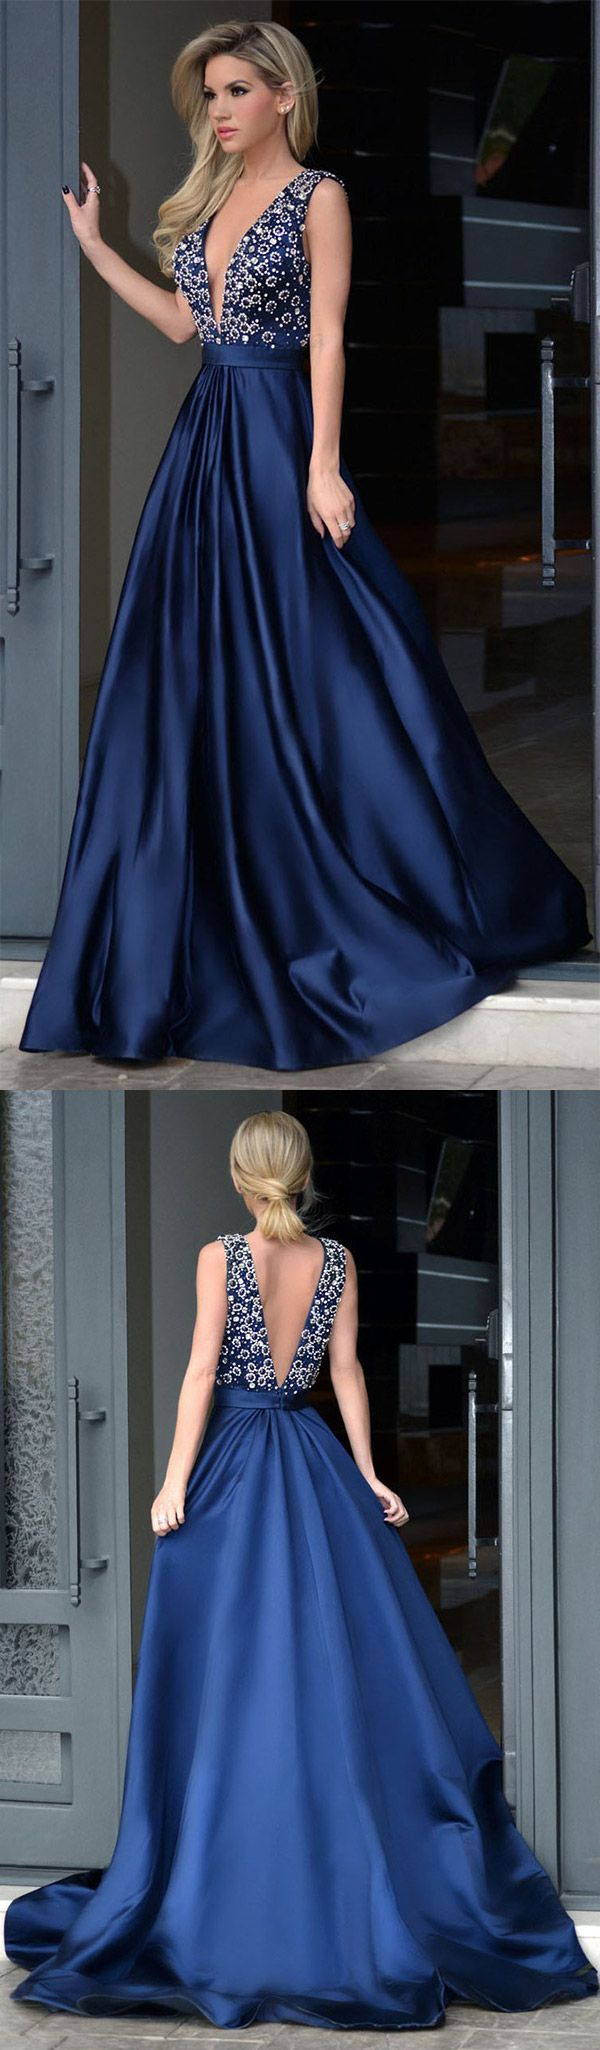 Long formal dresses aline royal blue prom dresses party